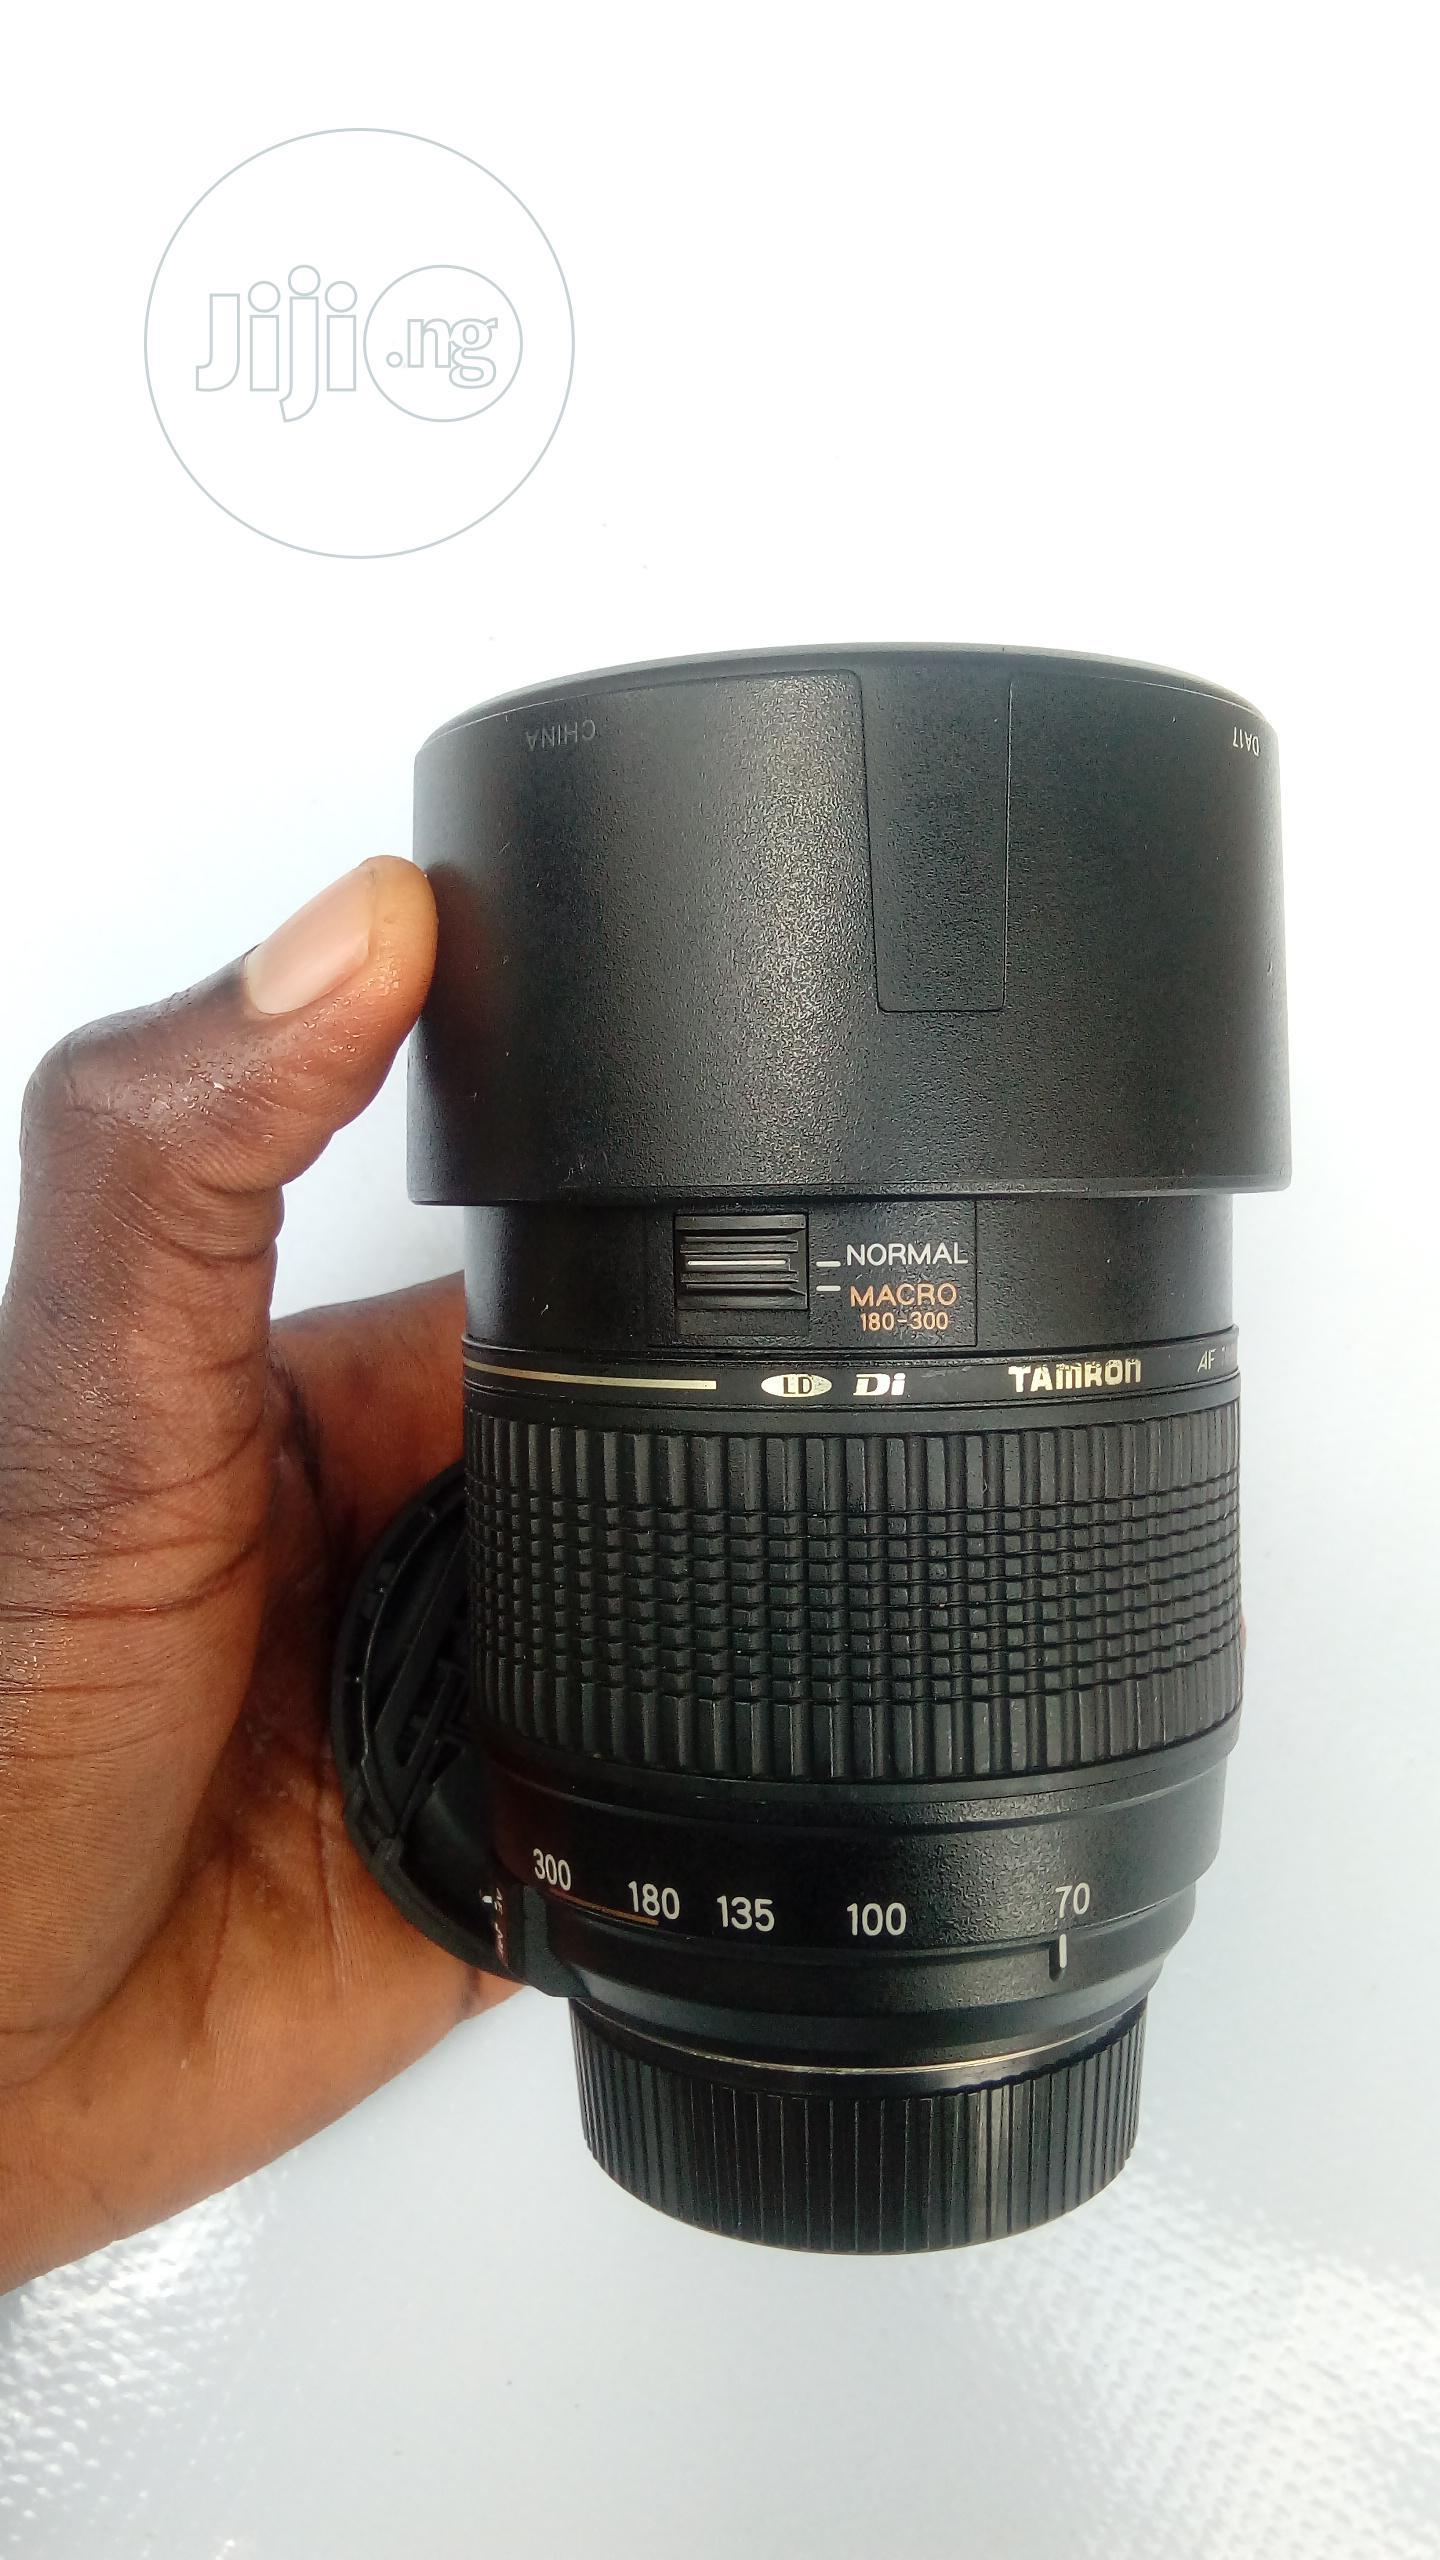 Archive: Tamron Lens 70-300mm for Nikon